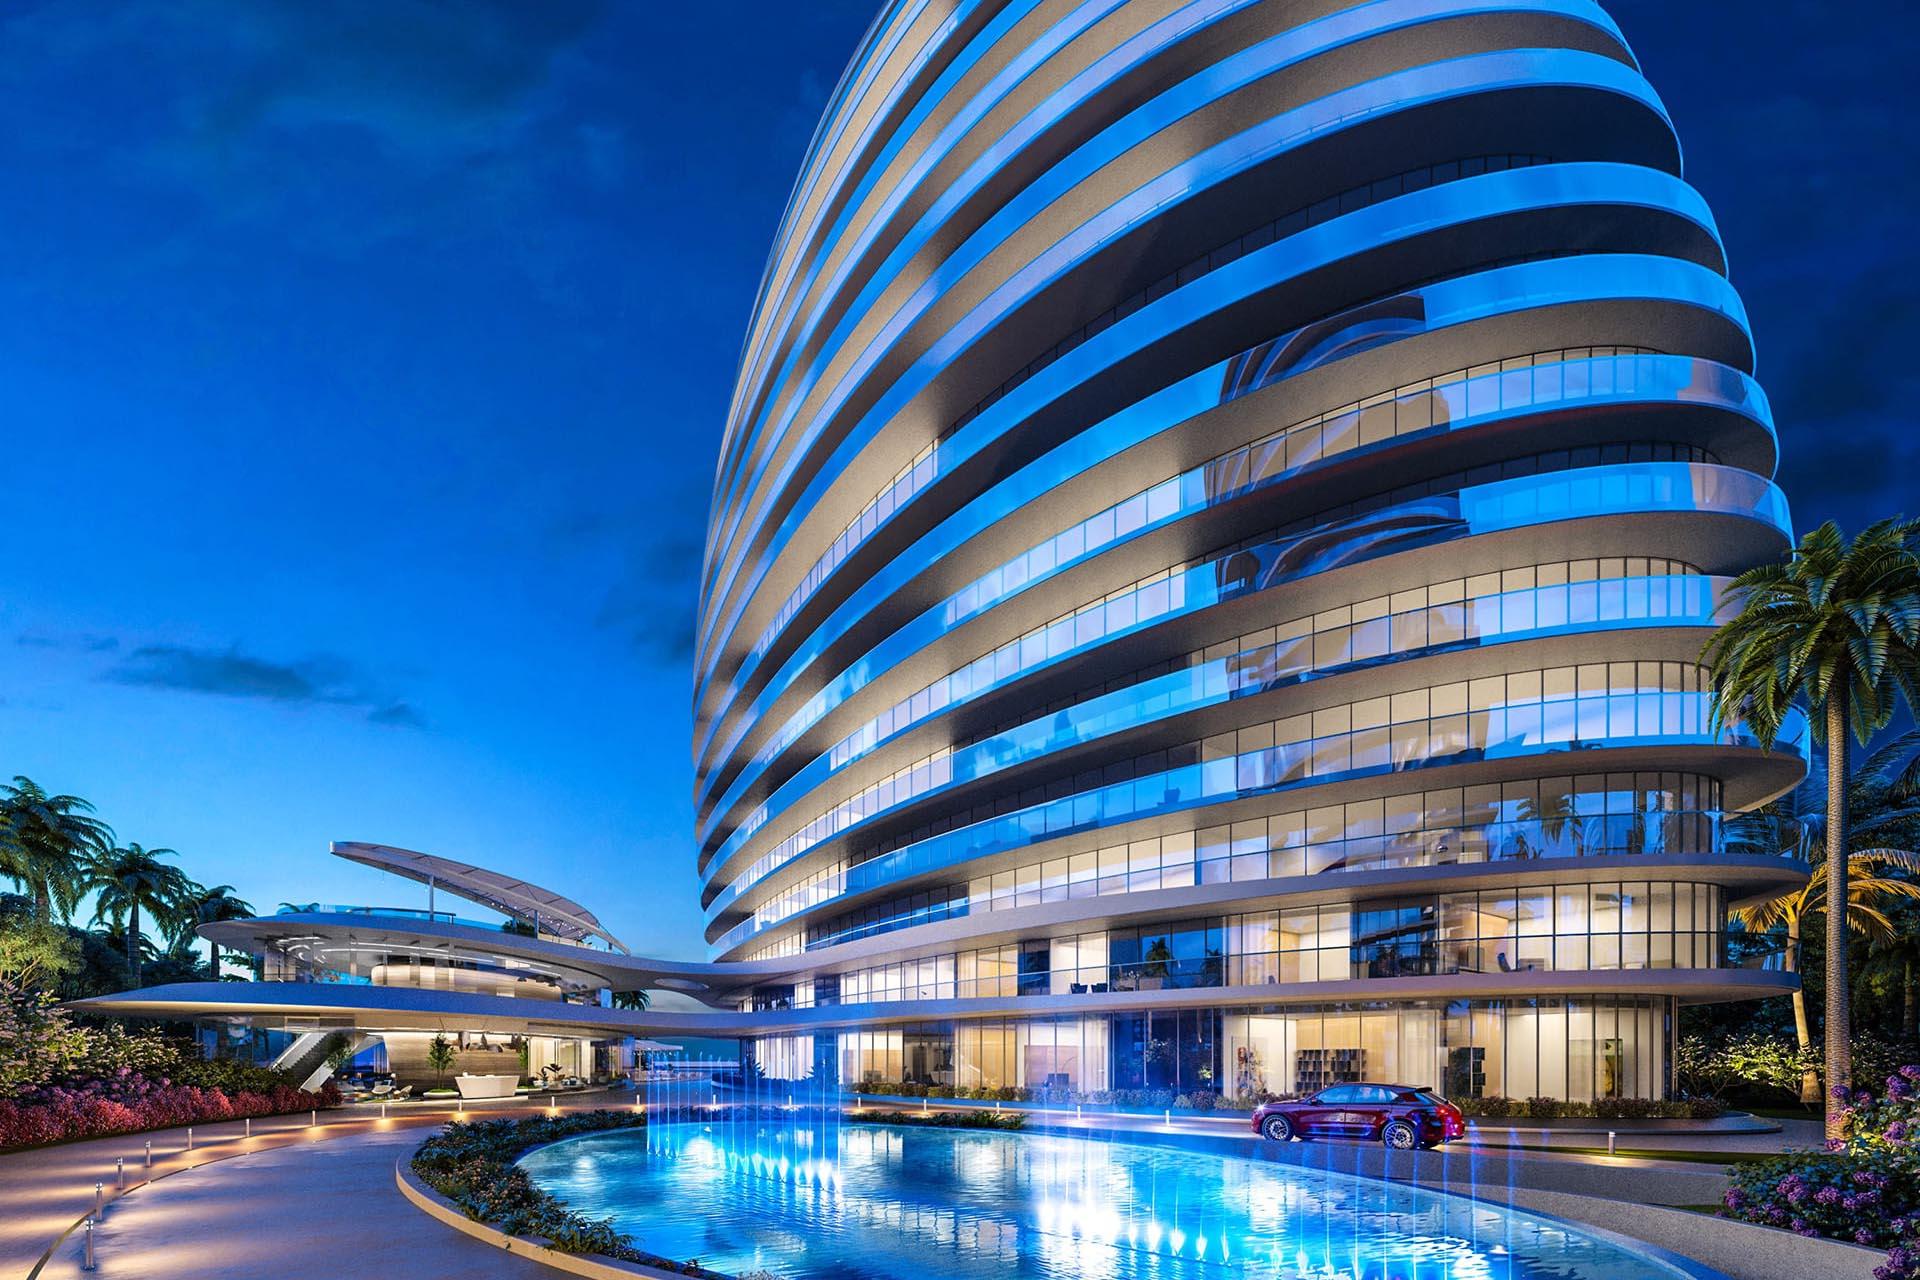 Invertirán 2,500 mdp en residencial de Acapulco